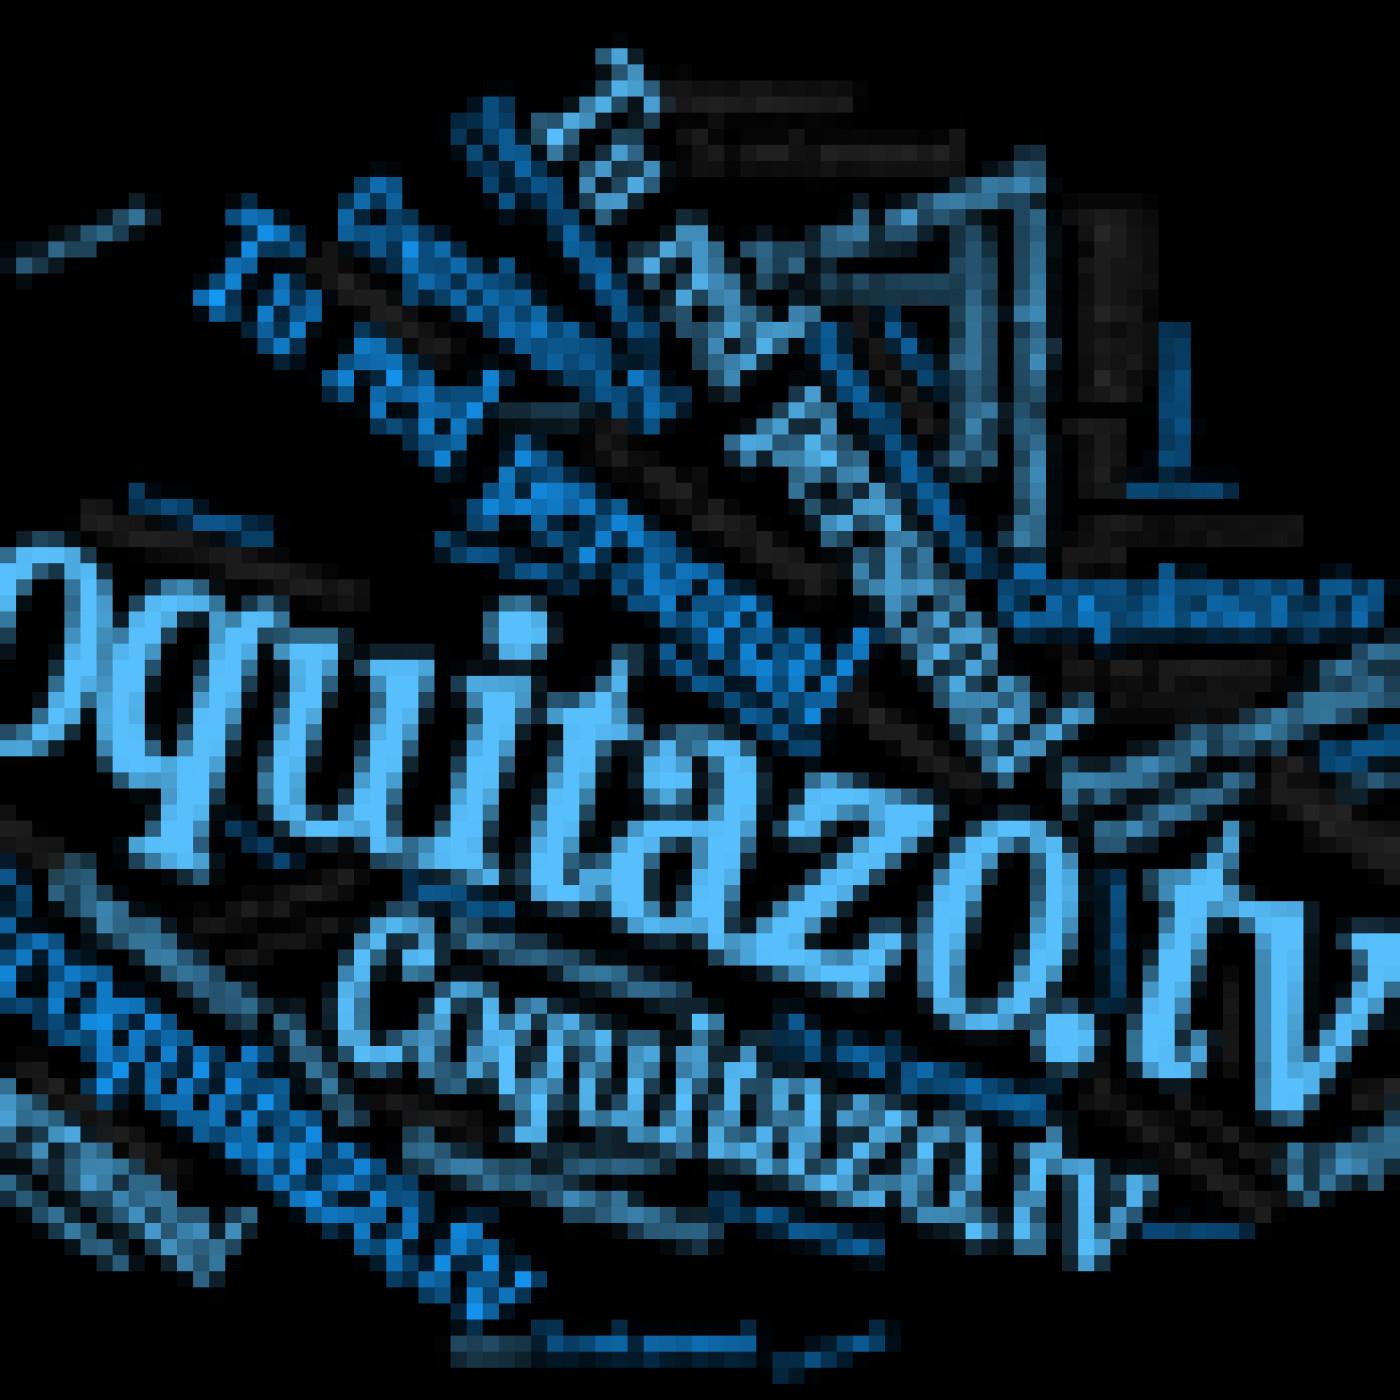 <![CDATA[Coquitazo.tv y PrestiDigitu.com]]>